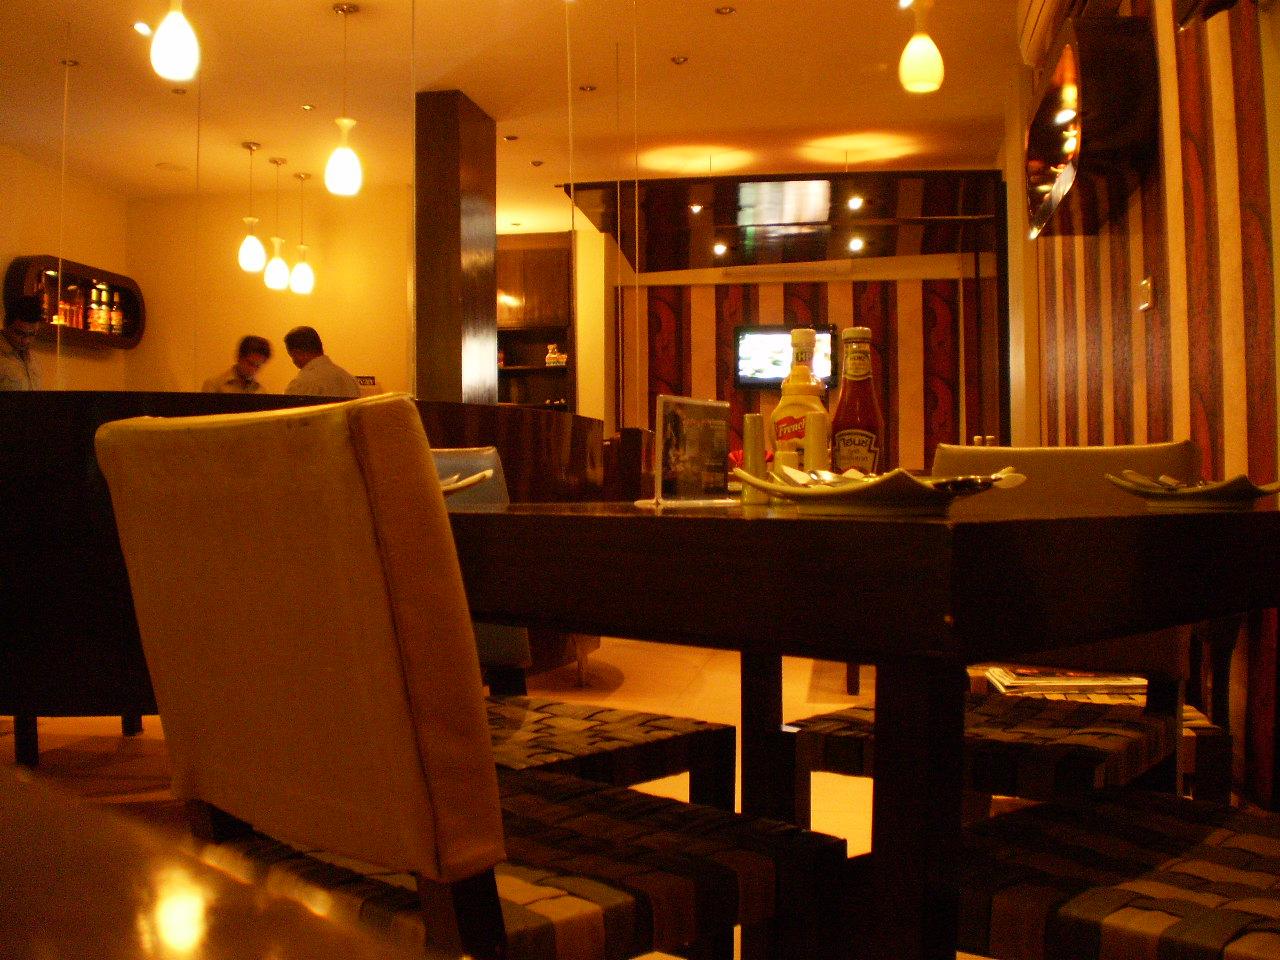 Karachi eating out olé cafe zamzama defence